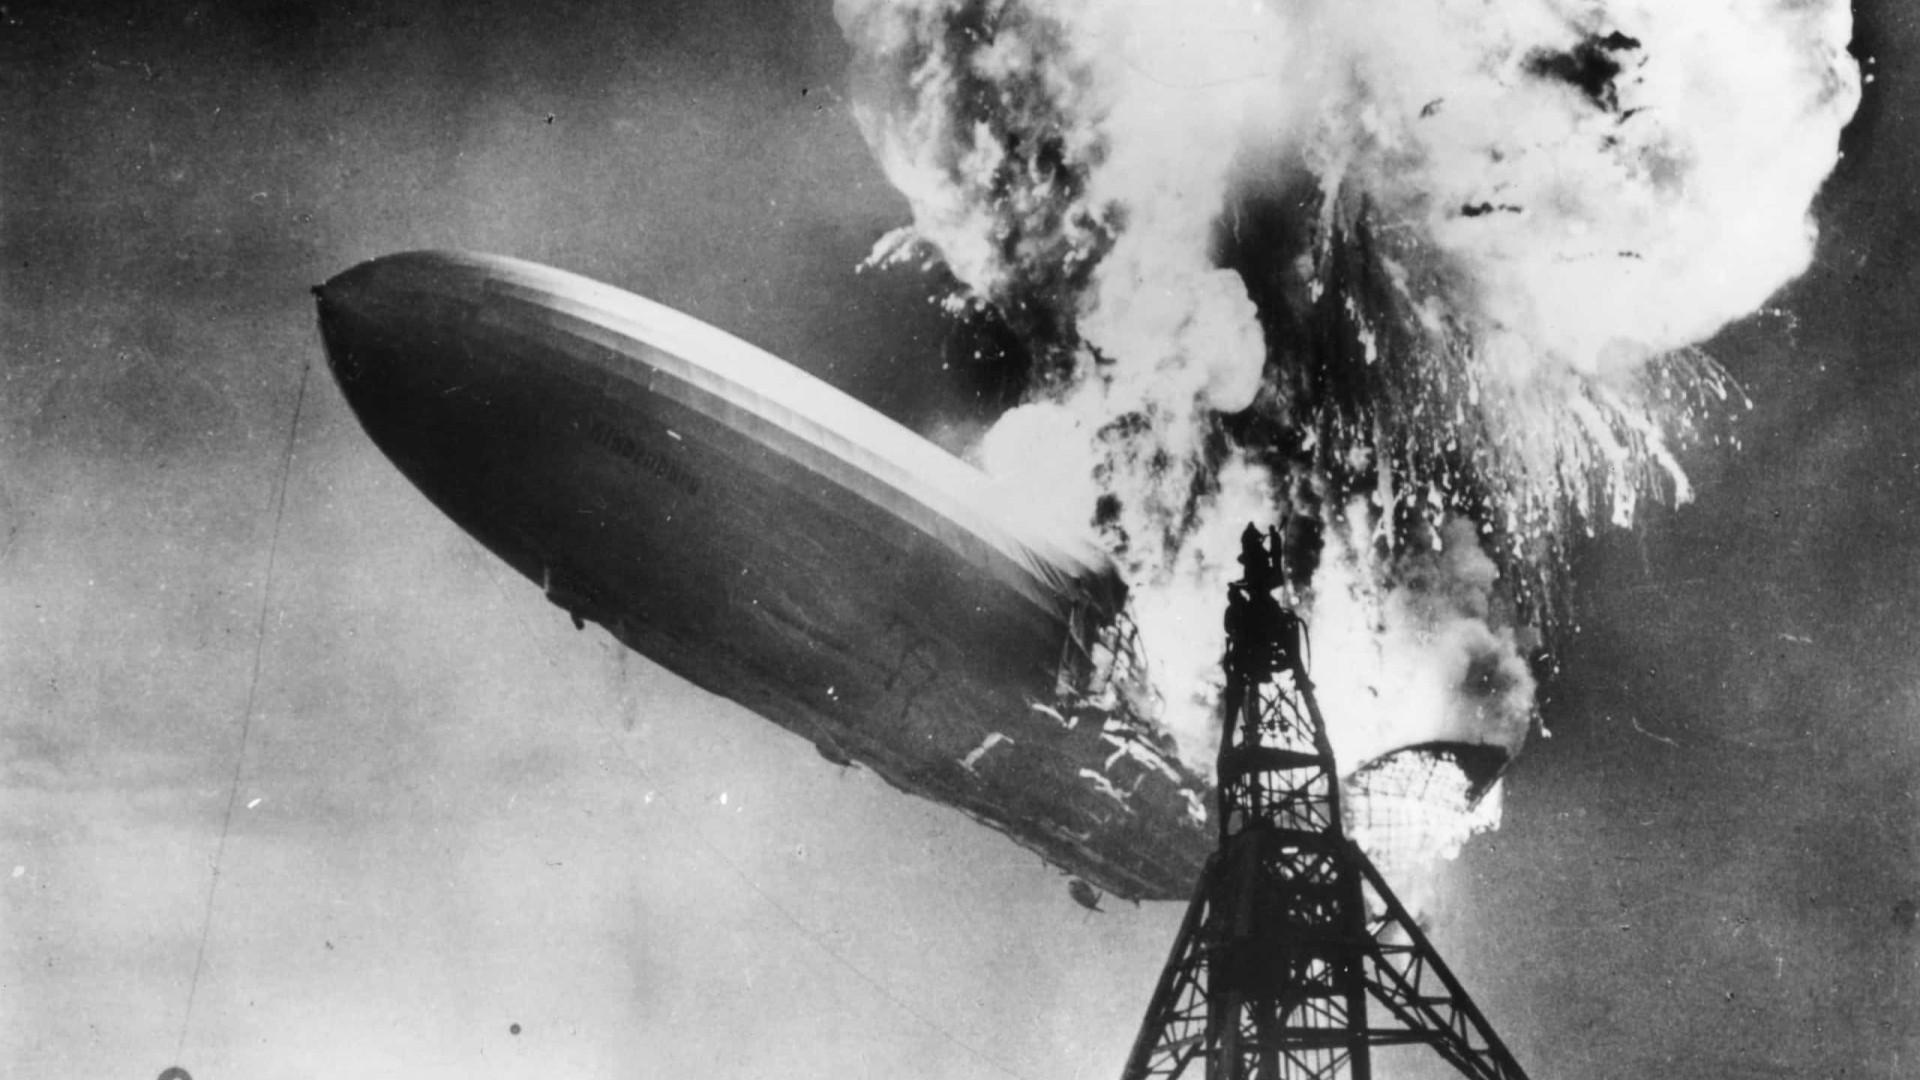 Morreu o último sobrevivente do desastre do Hindenburg